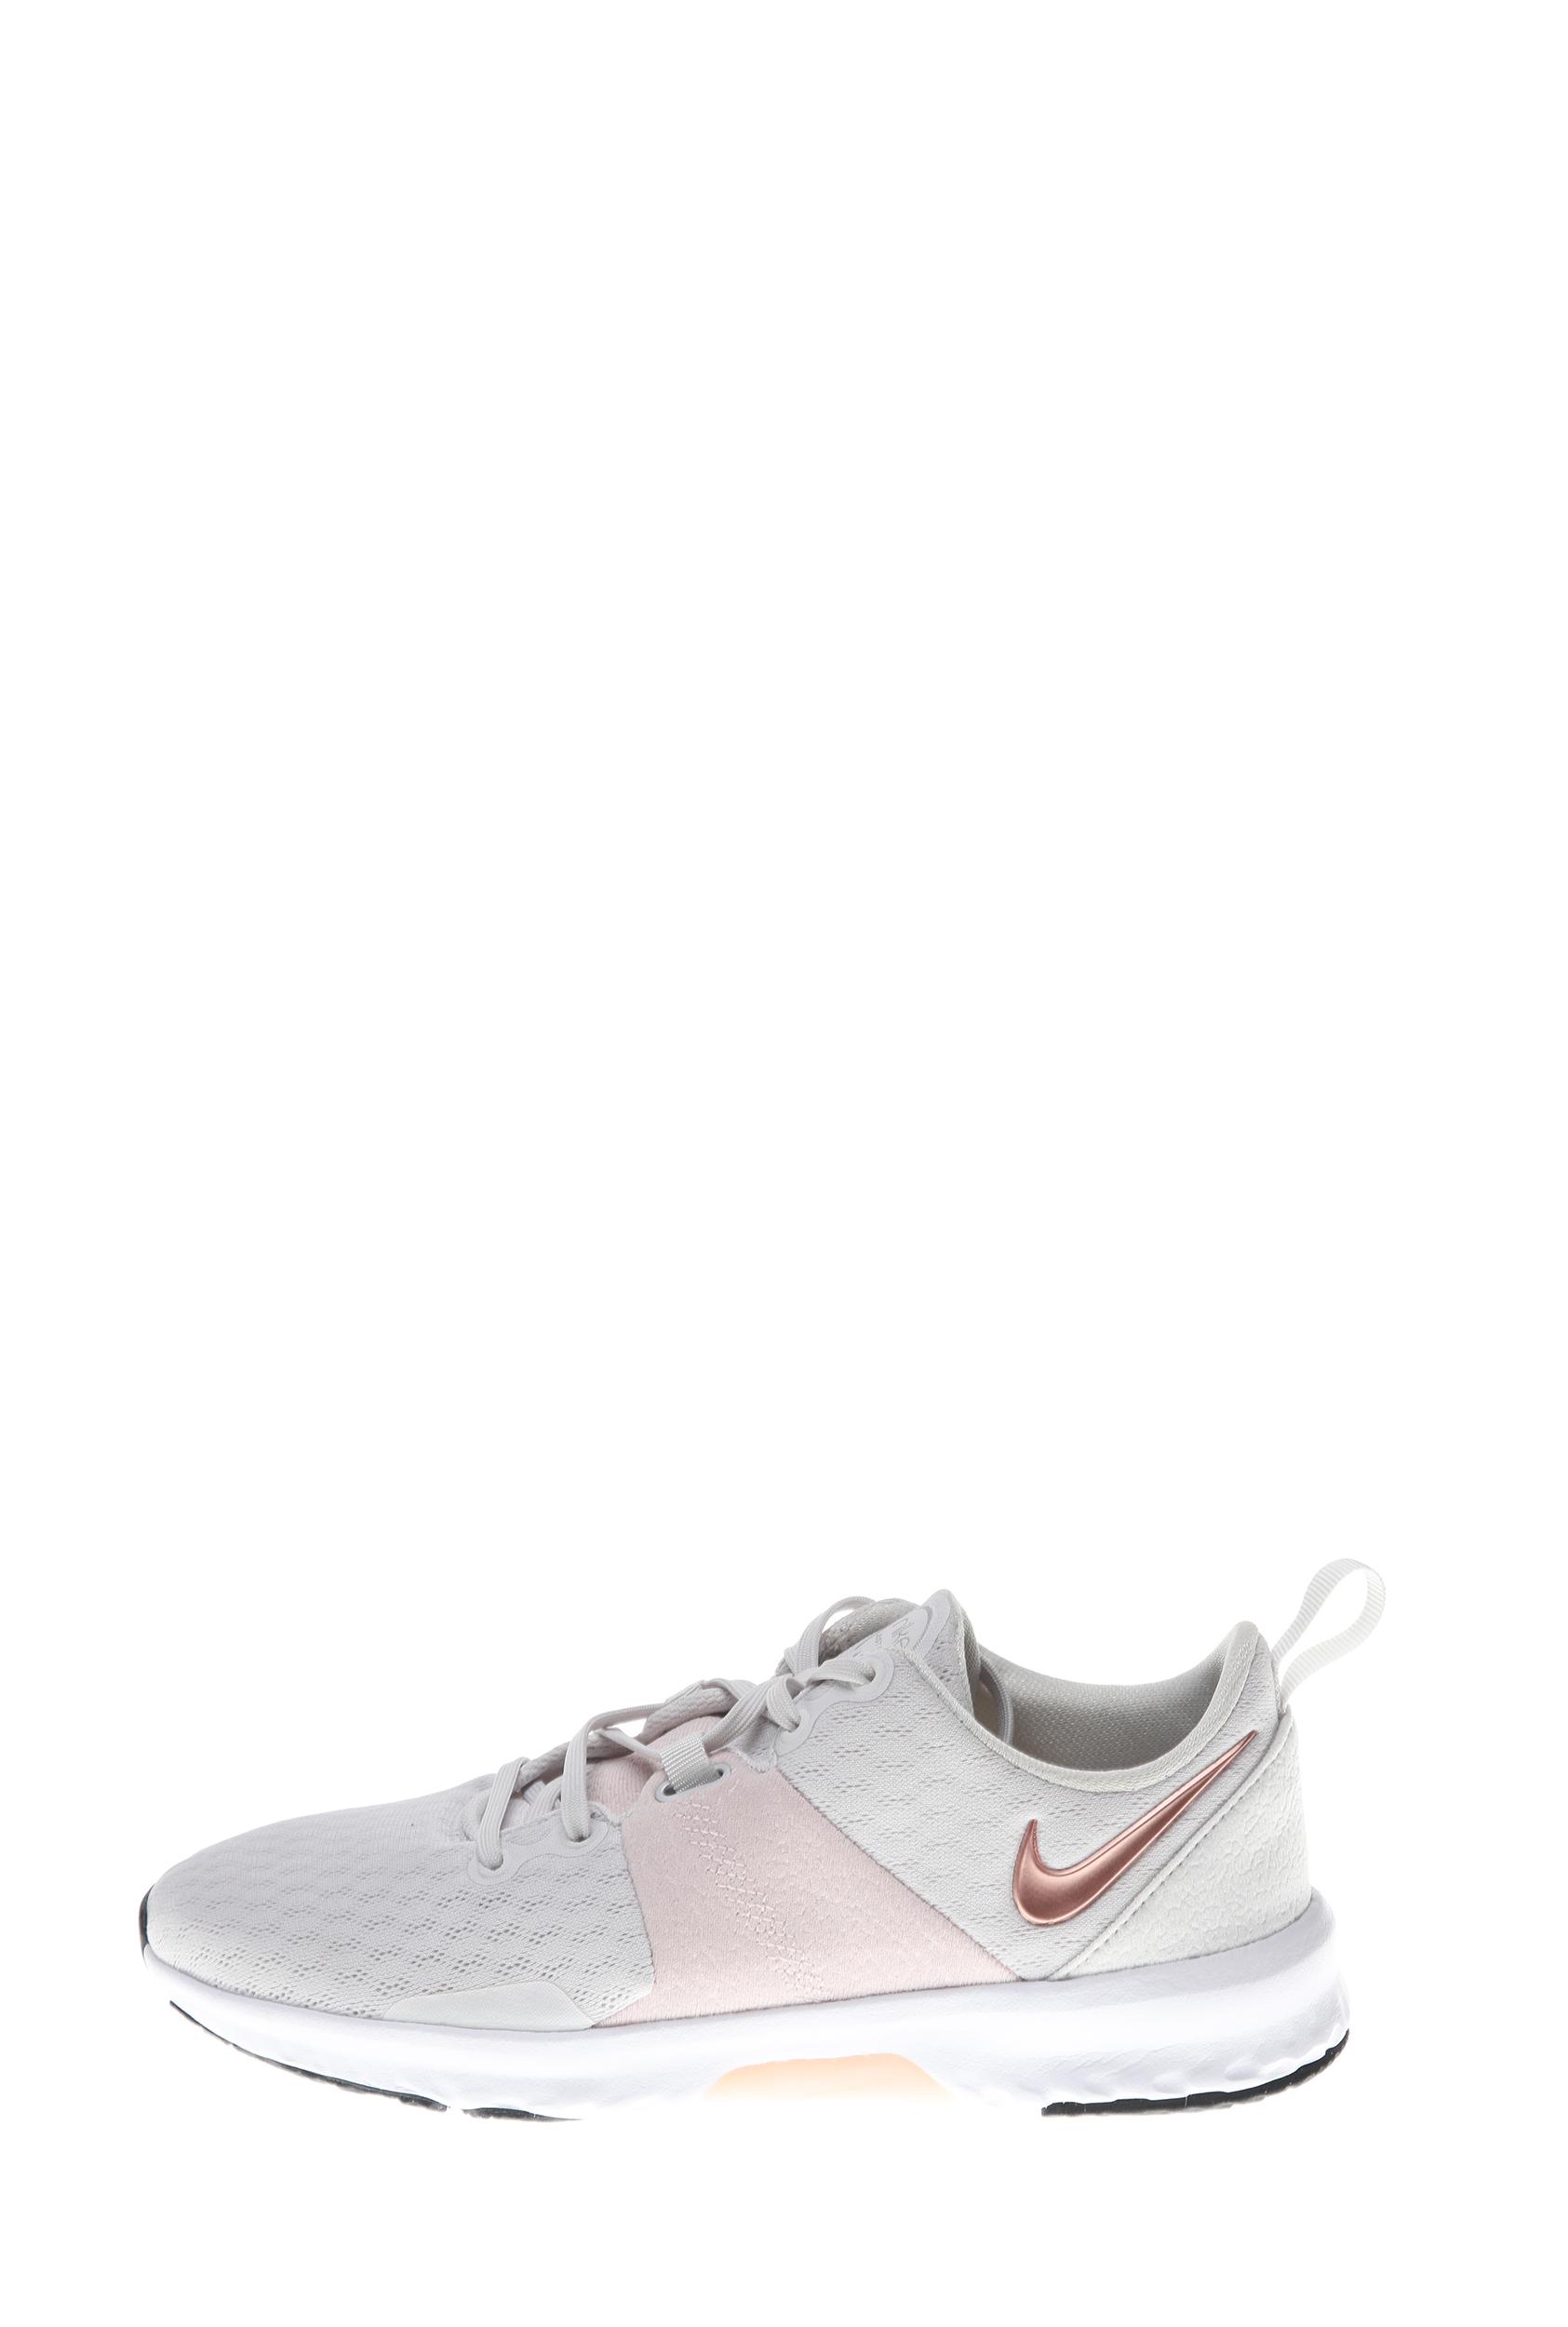 NIKE – Γυναικεία αθλητικά παπούτσια NIKE WMNS NIKE CITY TRAINER 3 γκρί